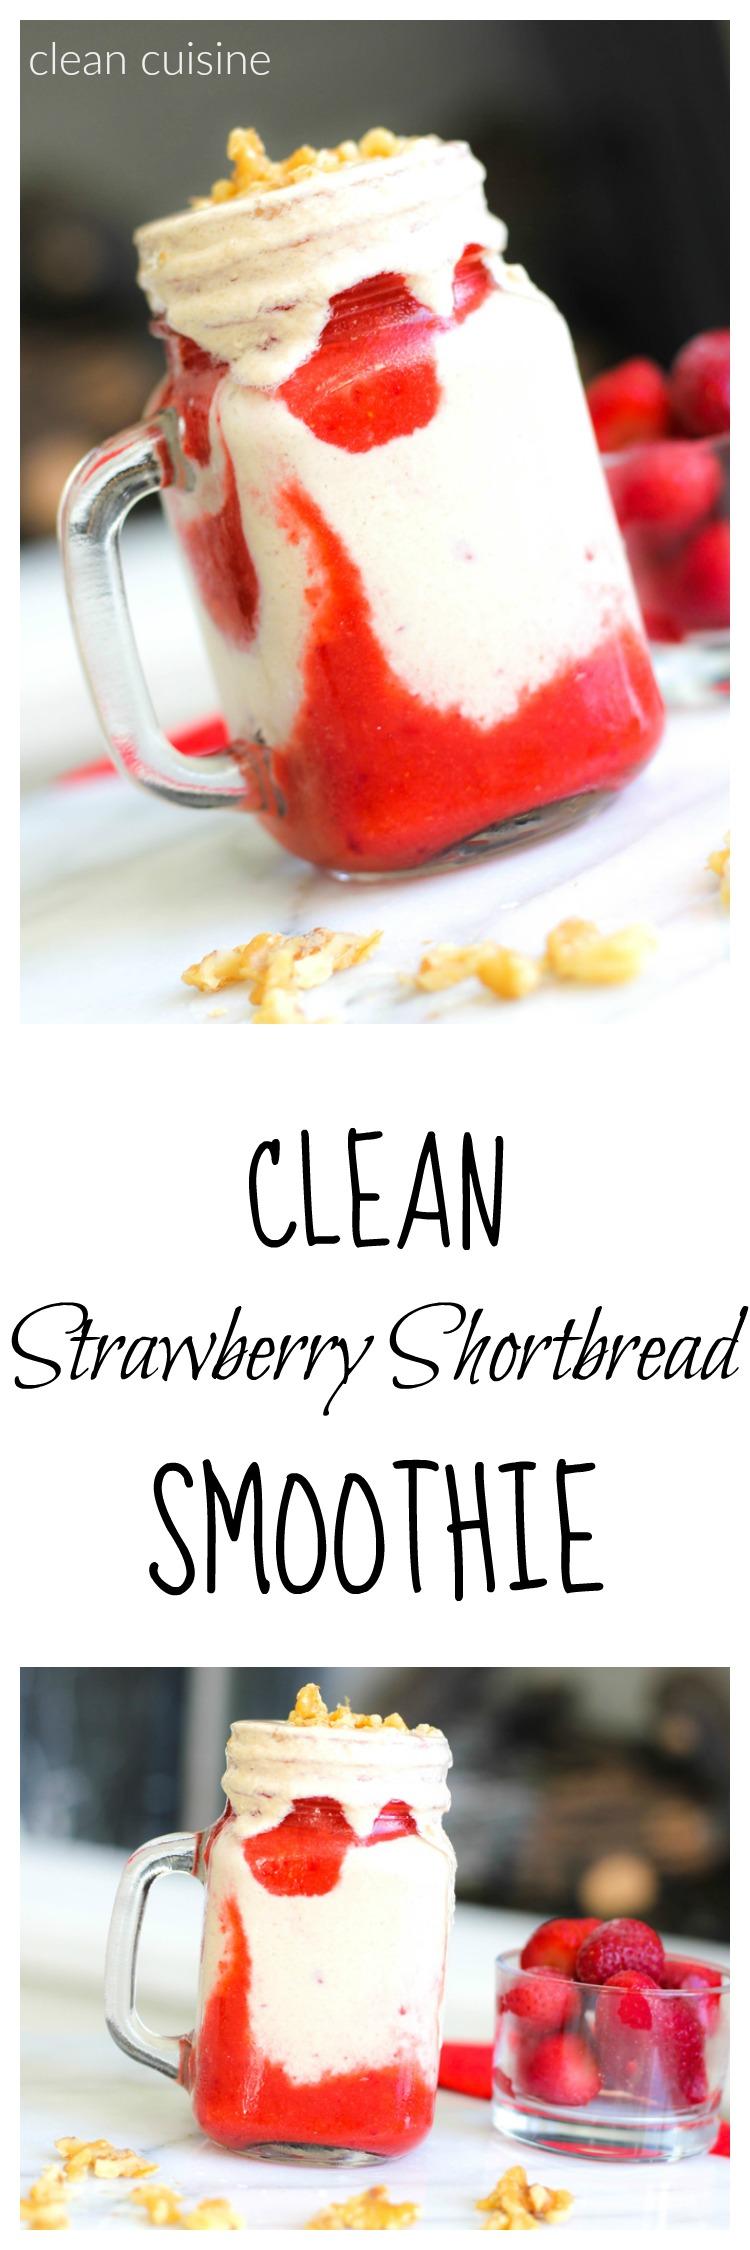 Strawberry Shortbread Smoothie